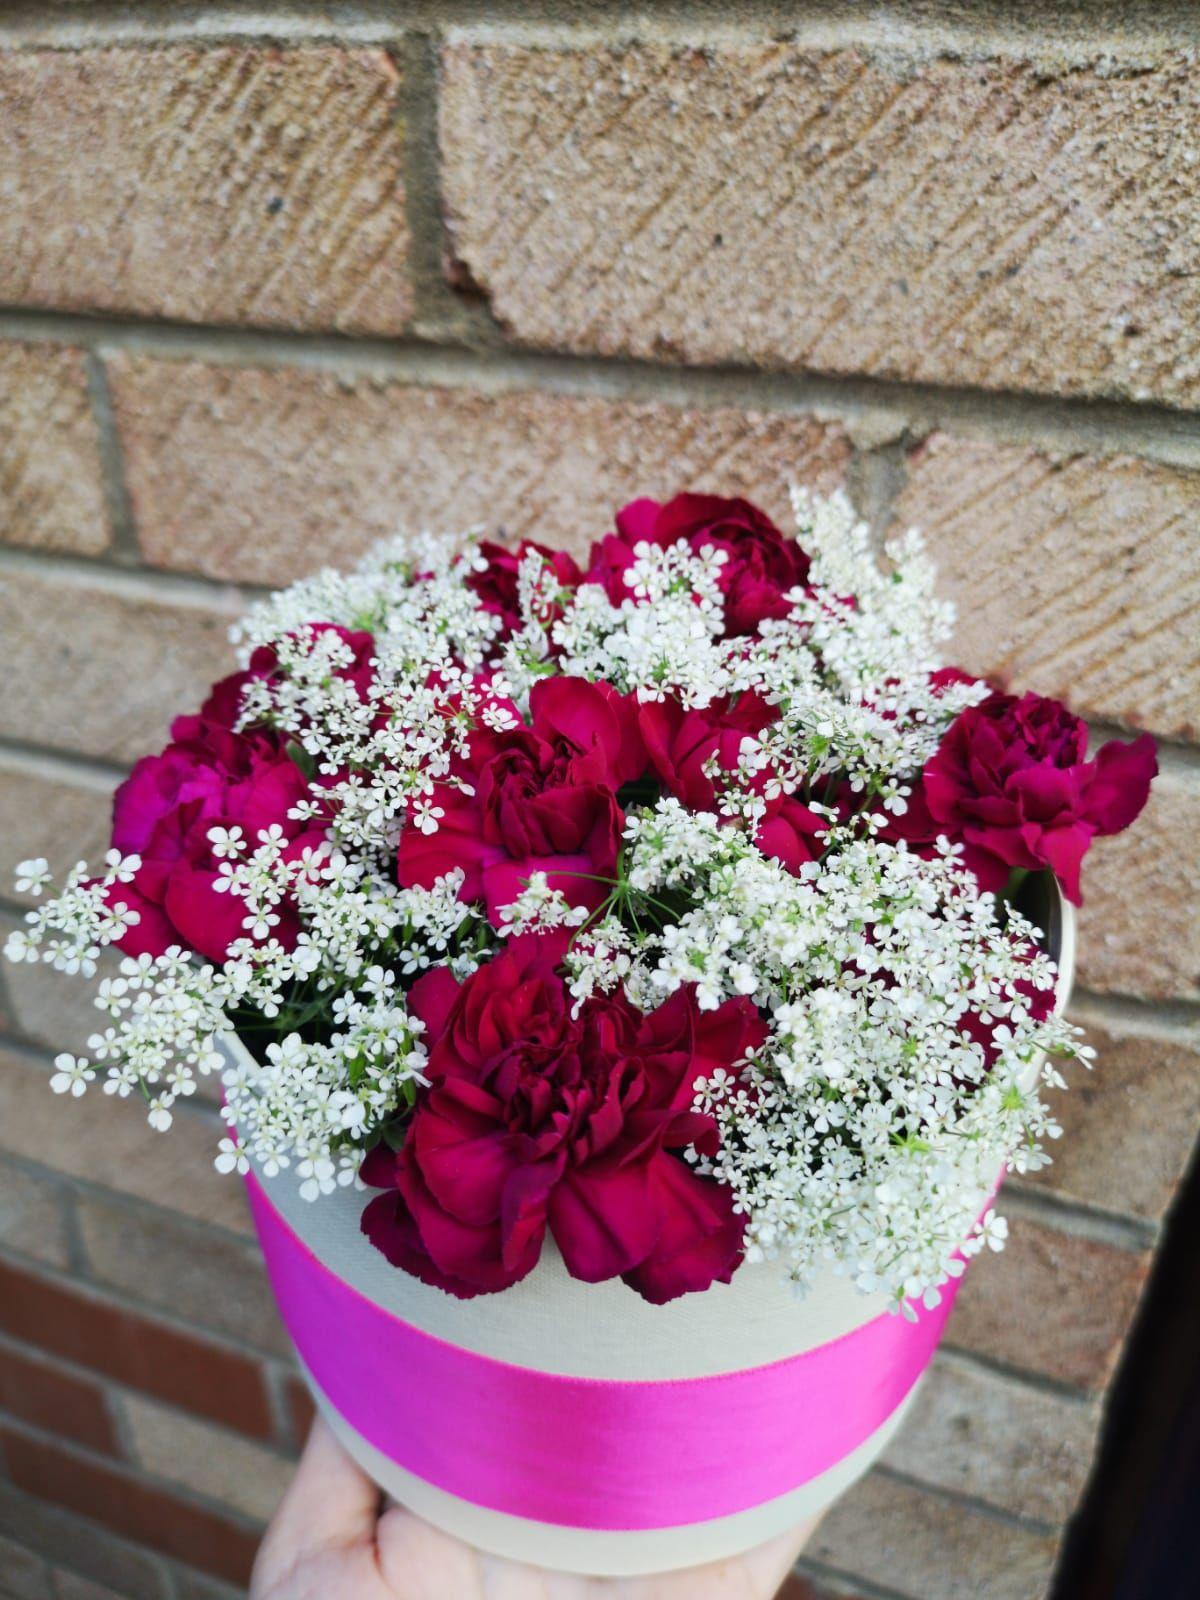 #flowerbox #purple #flowerlover #arrangement #carnations #gift #diy #diyproject #floral #design